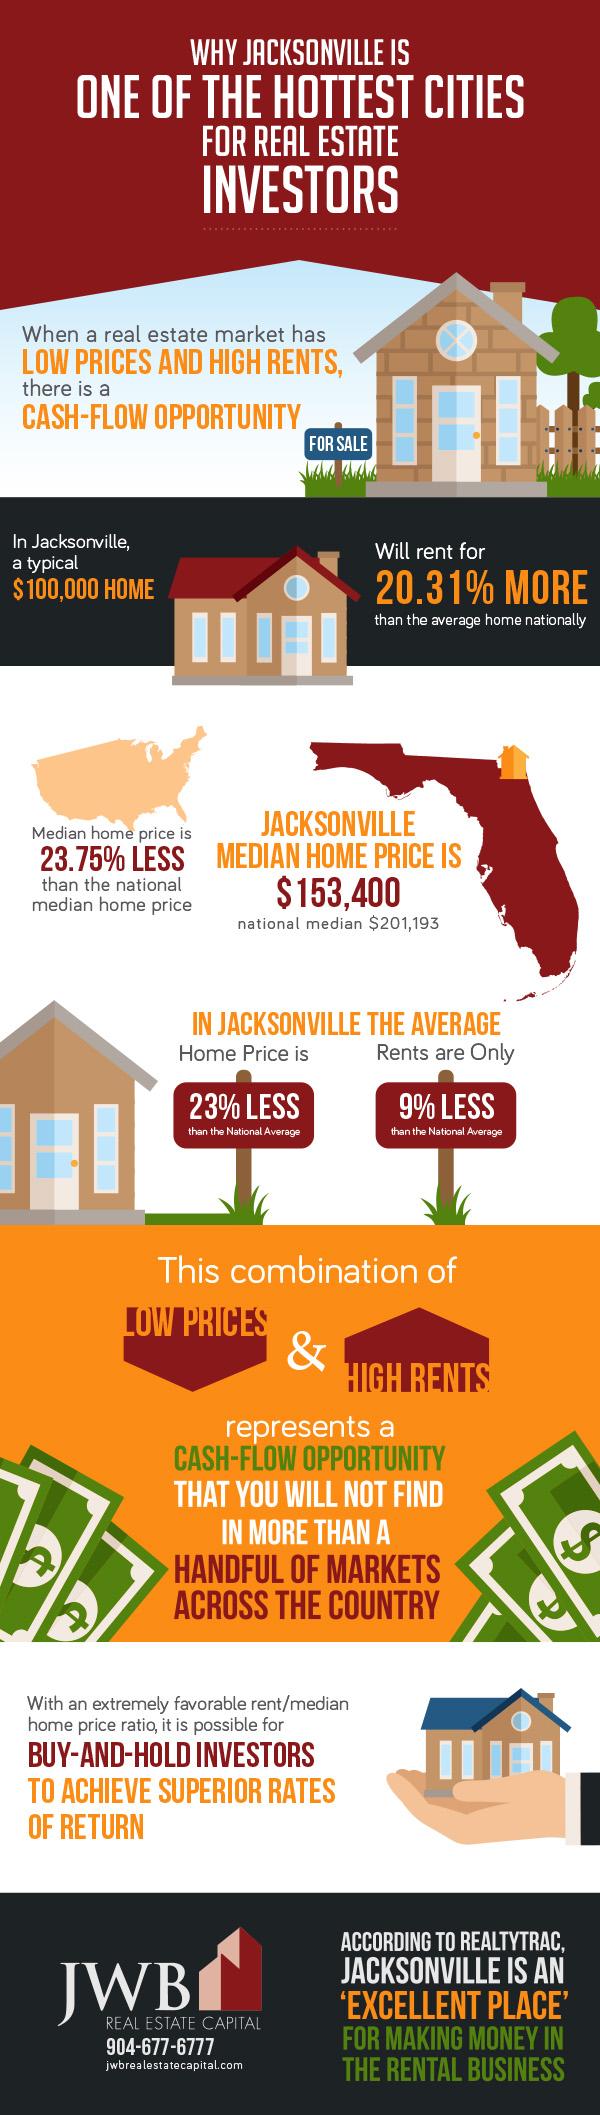 jwb-infographic